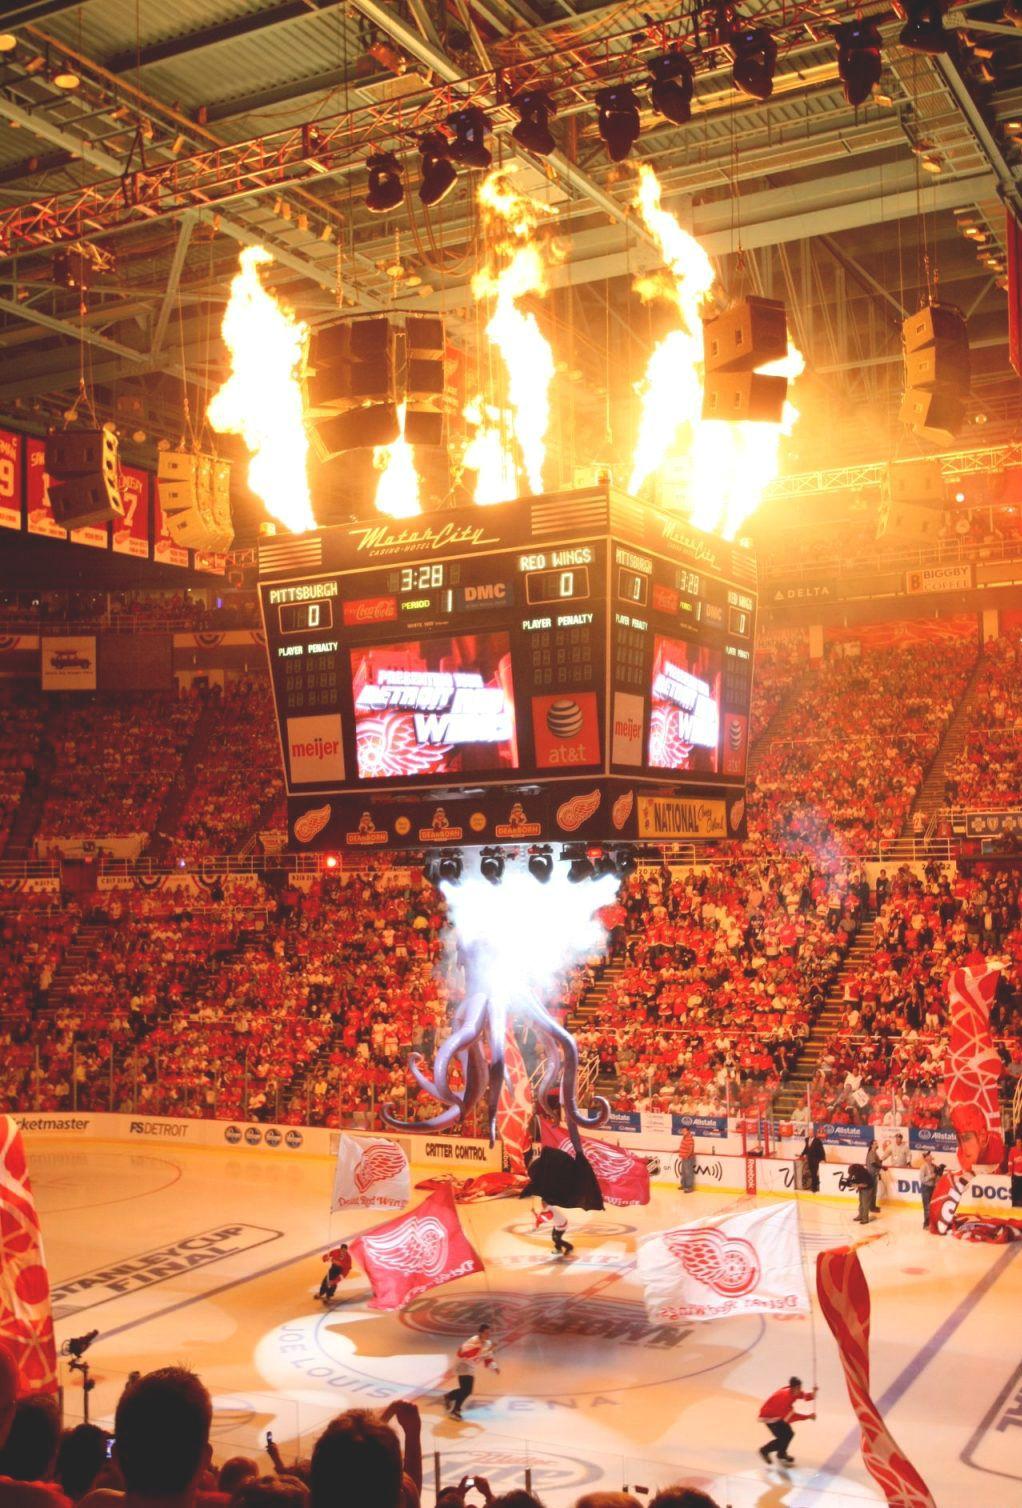 Rockin' the Joe! Red wings hockey, Detroit red wings